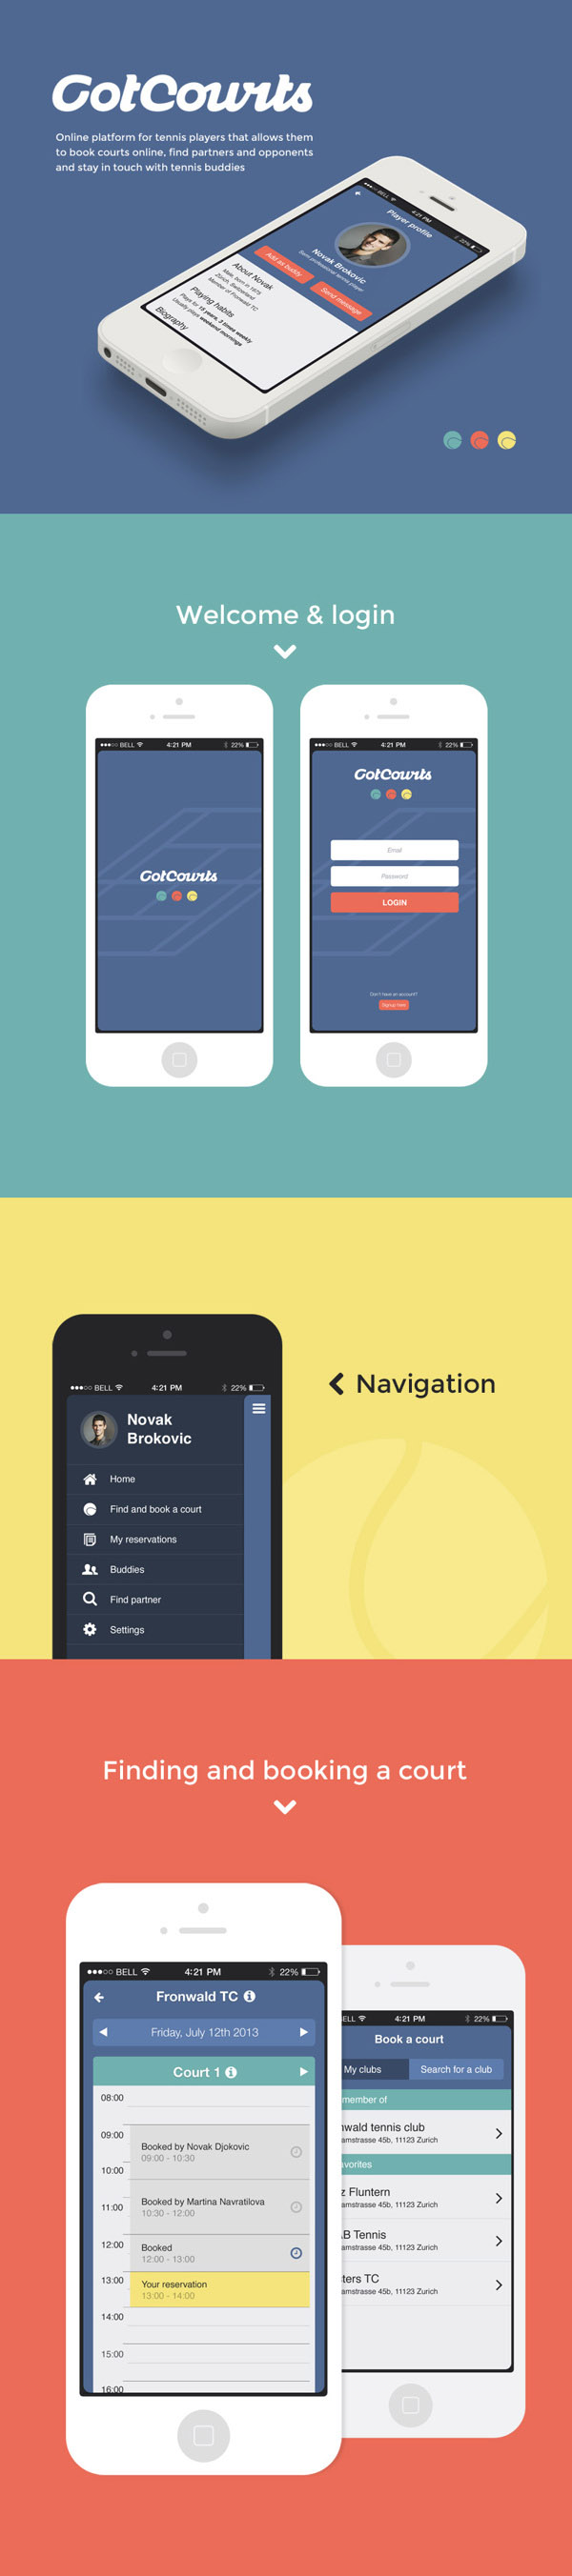 got courts Mobile UI Design Inspiration #3